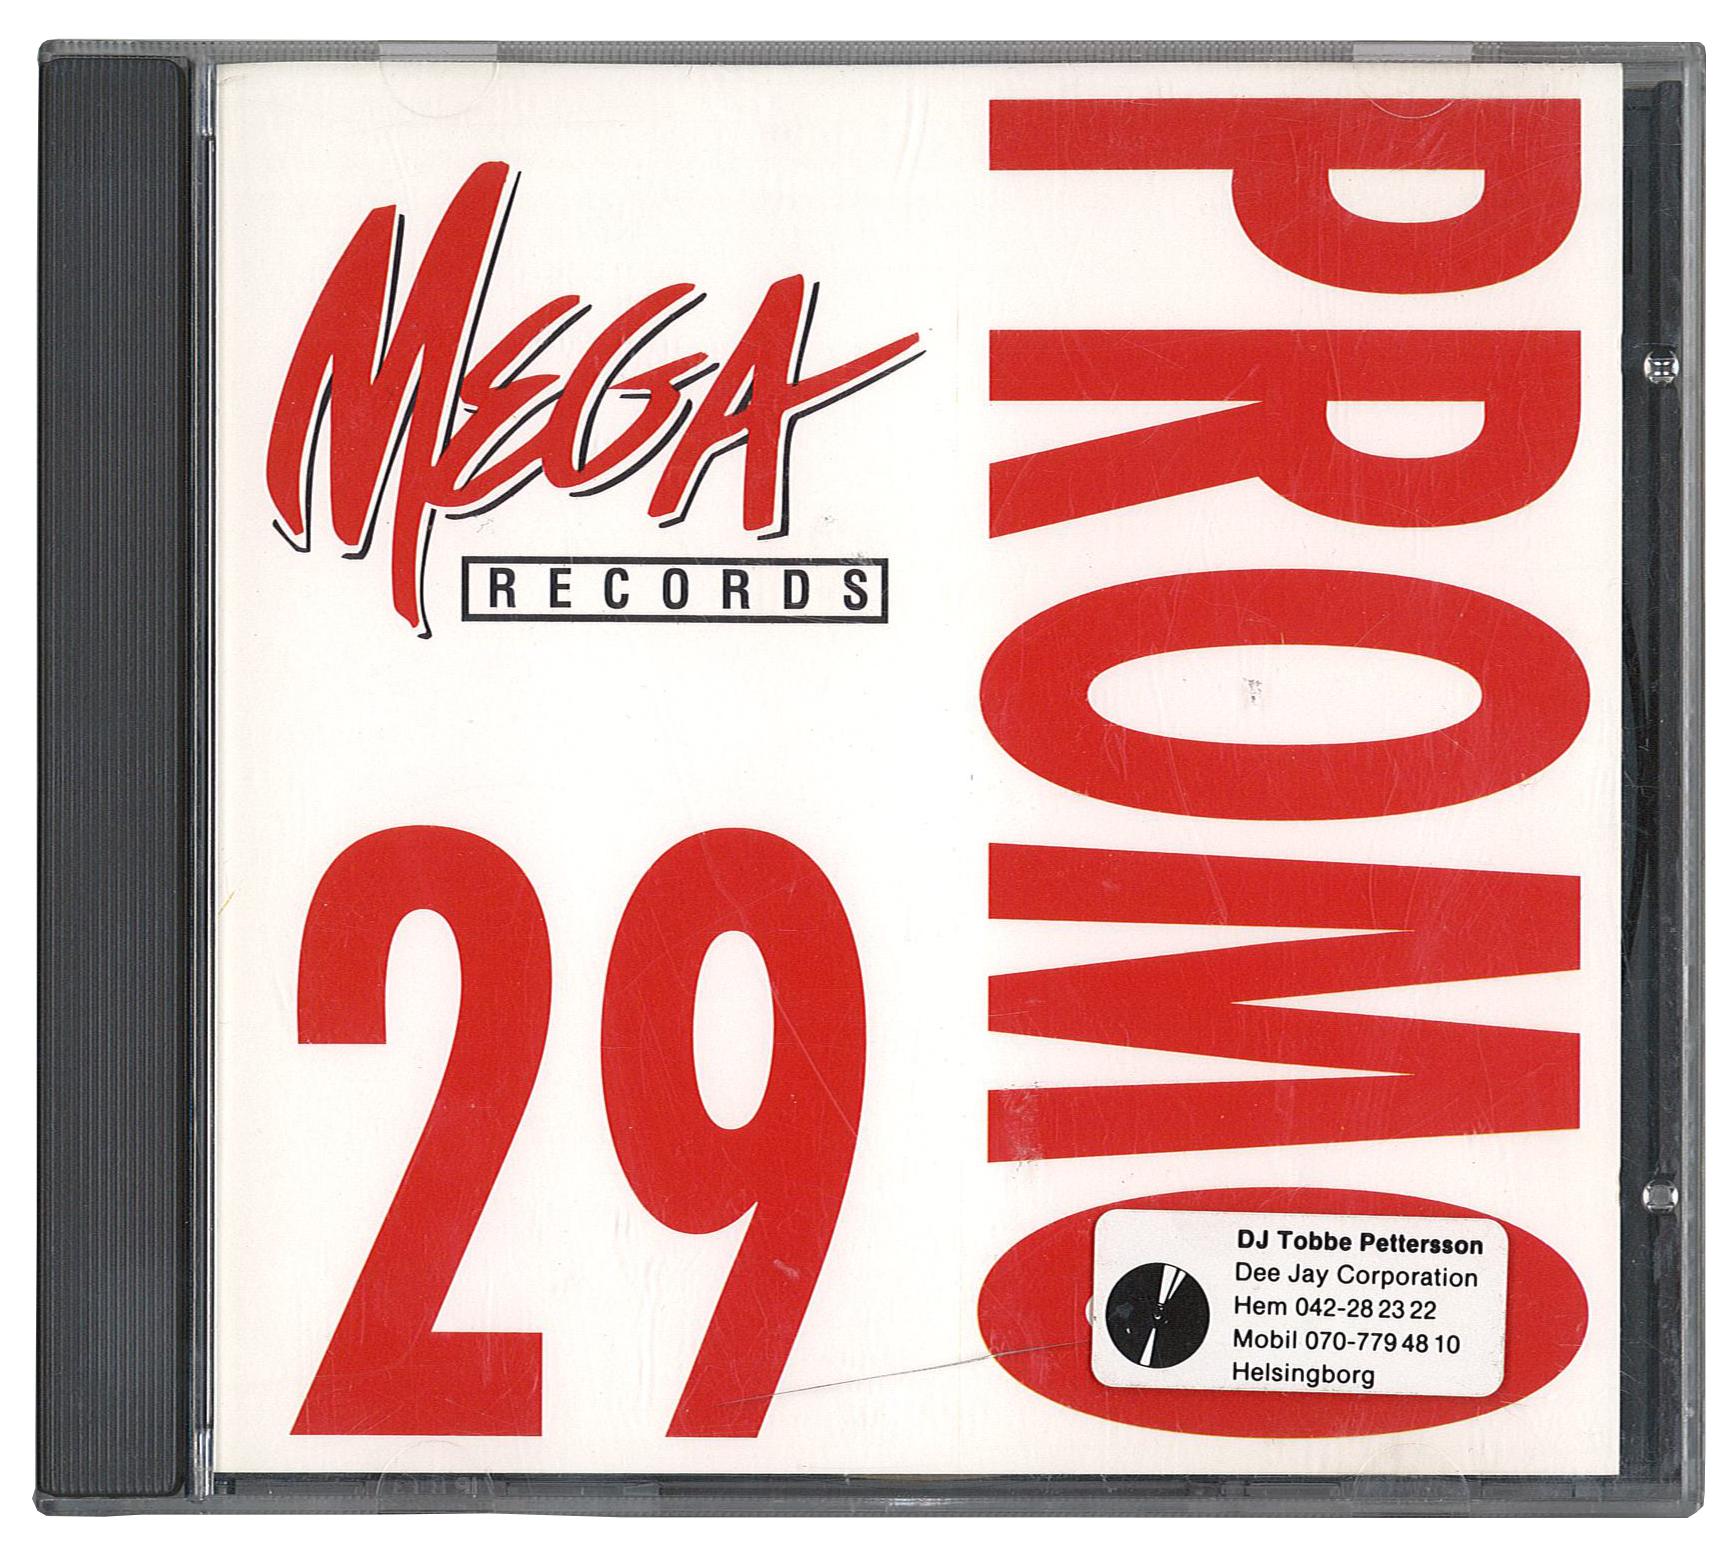 WLWLTDOO-1995-CD-PROMO_29-PROMOCD-2667-FRONT.jpg